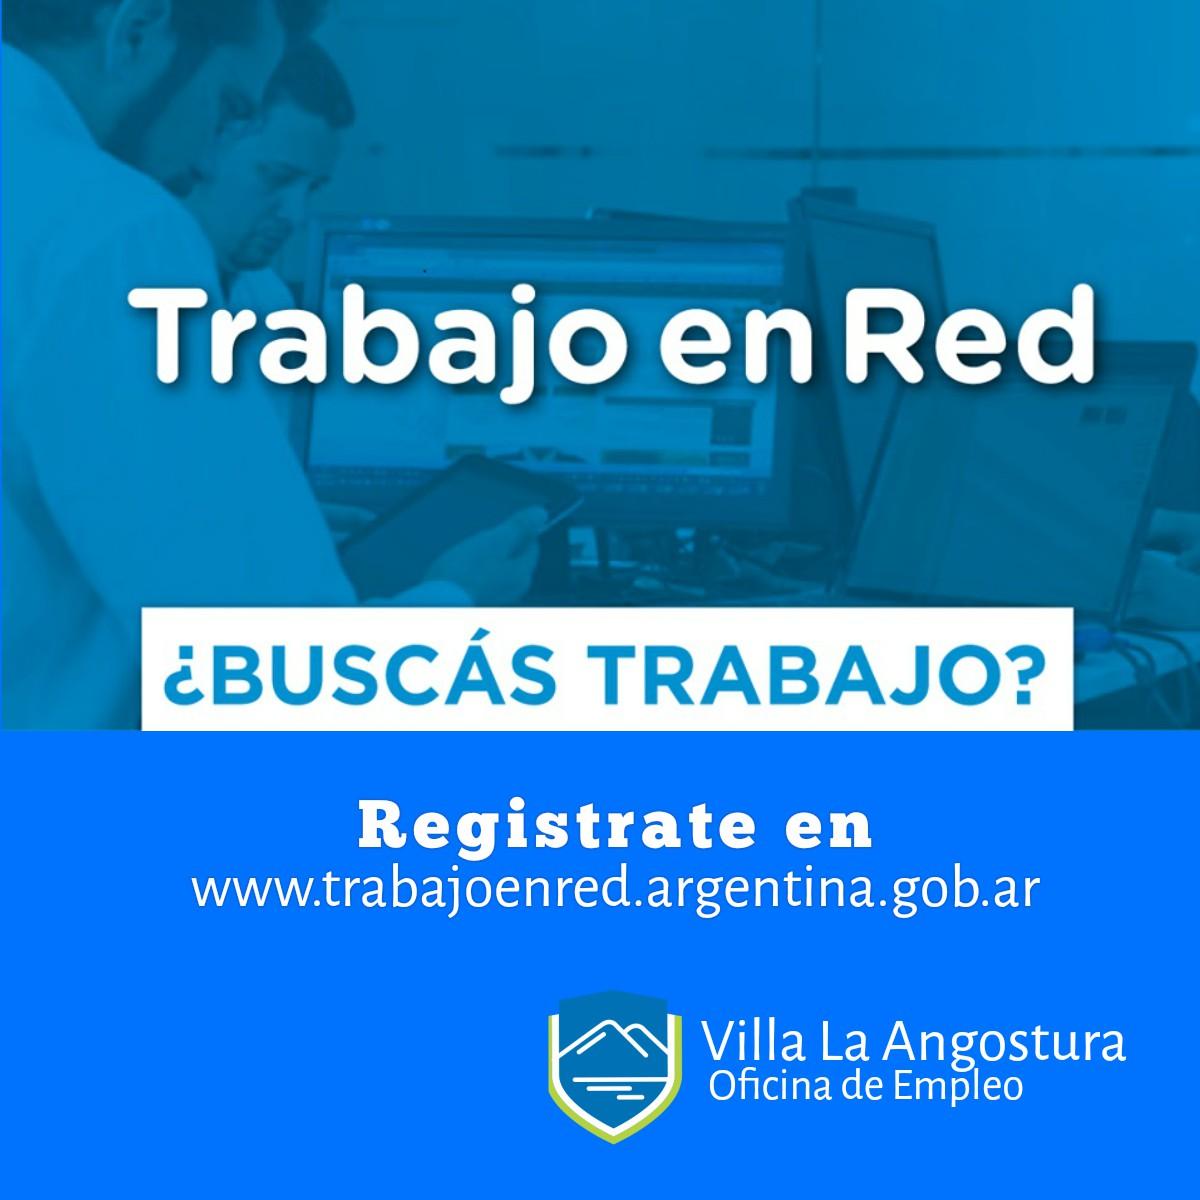 Prensa de la Municipalidad de Villa La Angostura: febrero 2018